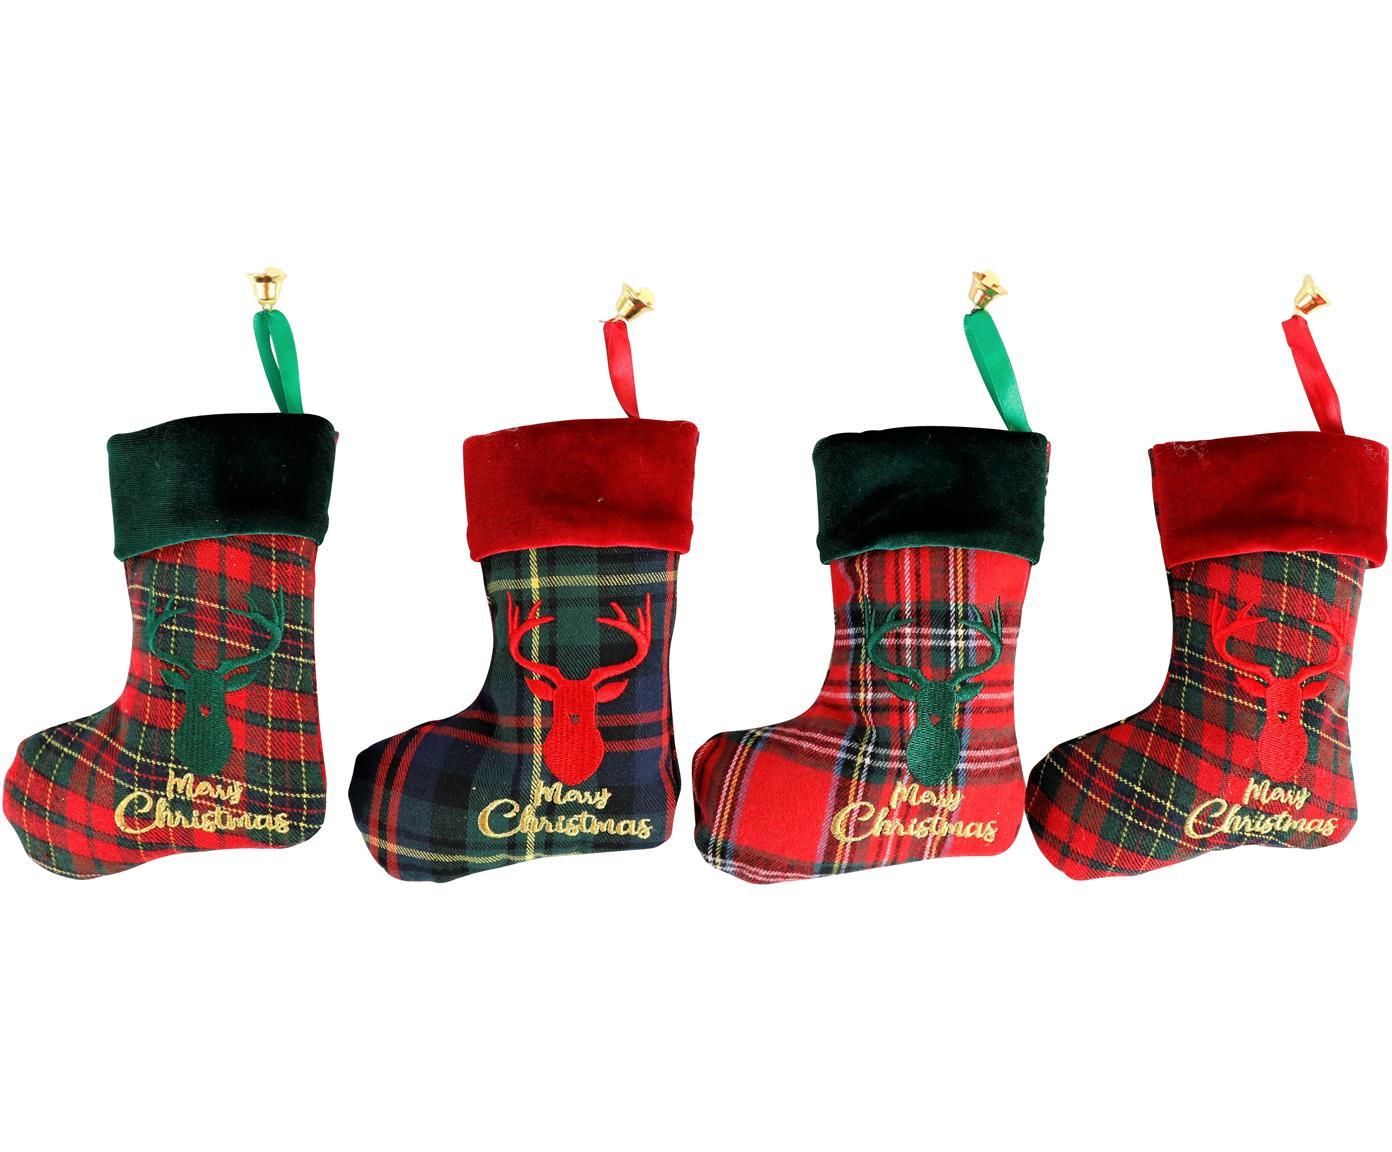 Deko-Objekt-Set Merry Christmas, 4-tlg., Polyester, Baumwolle, Grün, Rot, Schwarz, 14 x 17 cm